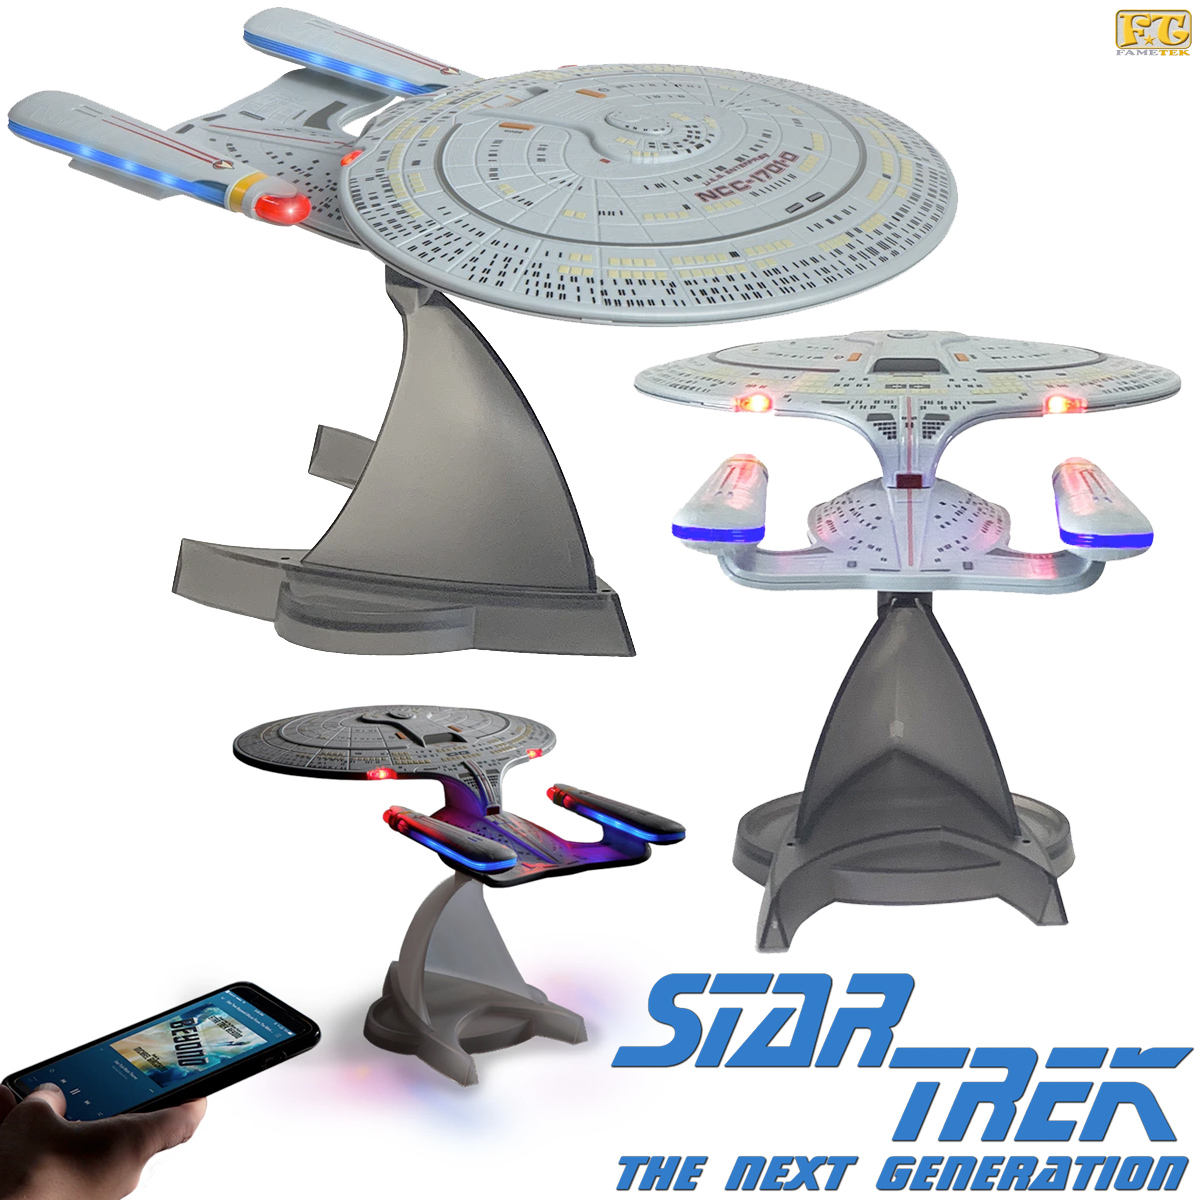 Caixa de Som Star Trek TNG USS Enterprise NCC-1701-D Bluetooth Speaker